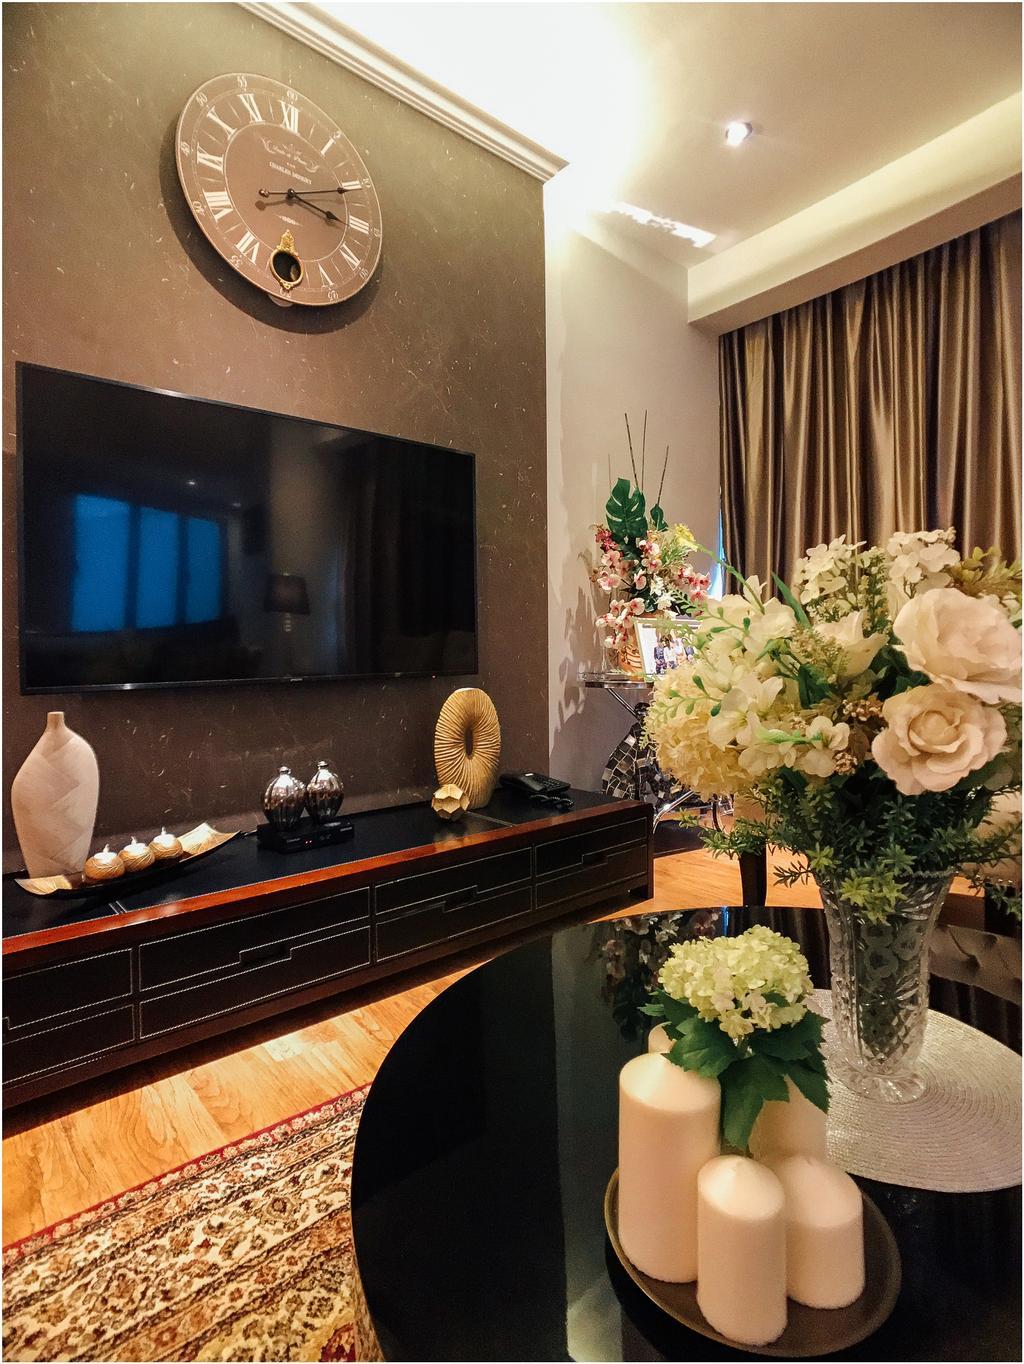 Contemporary, Condo, Living Room, Regent Grove, Interior Designer, Fatema Design Studio, Flora, Jar, Plant, Potted Plant, Pottery, Vase, Appliance, Electrical Device, Oven, Fireplace, Hearth